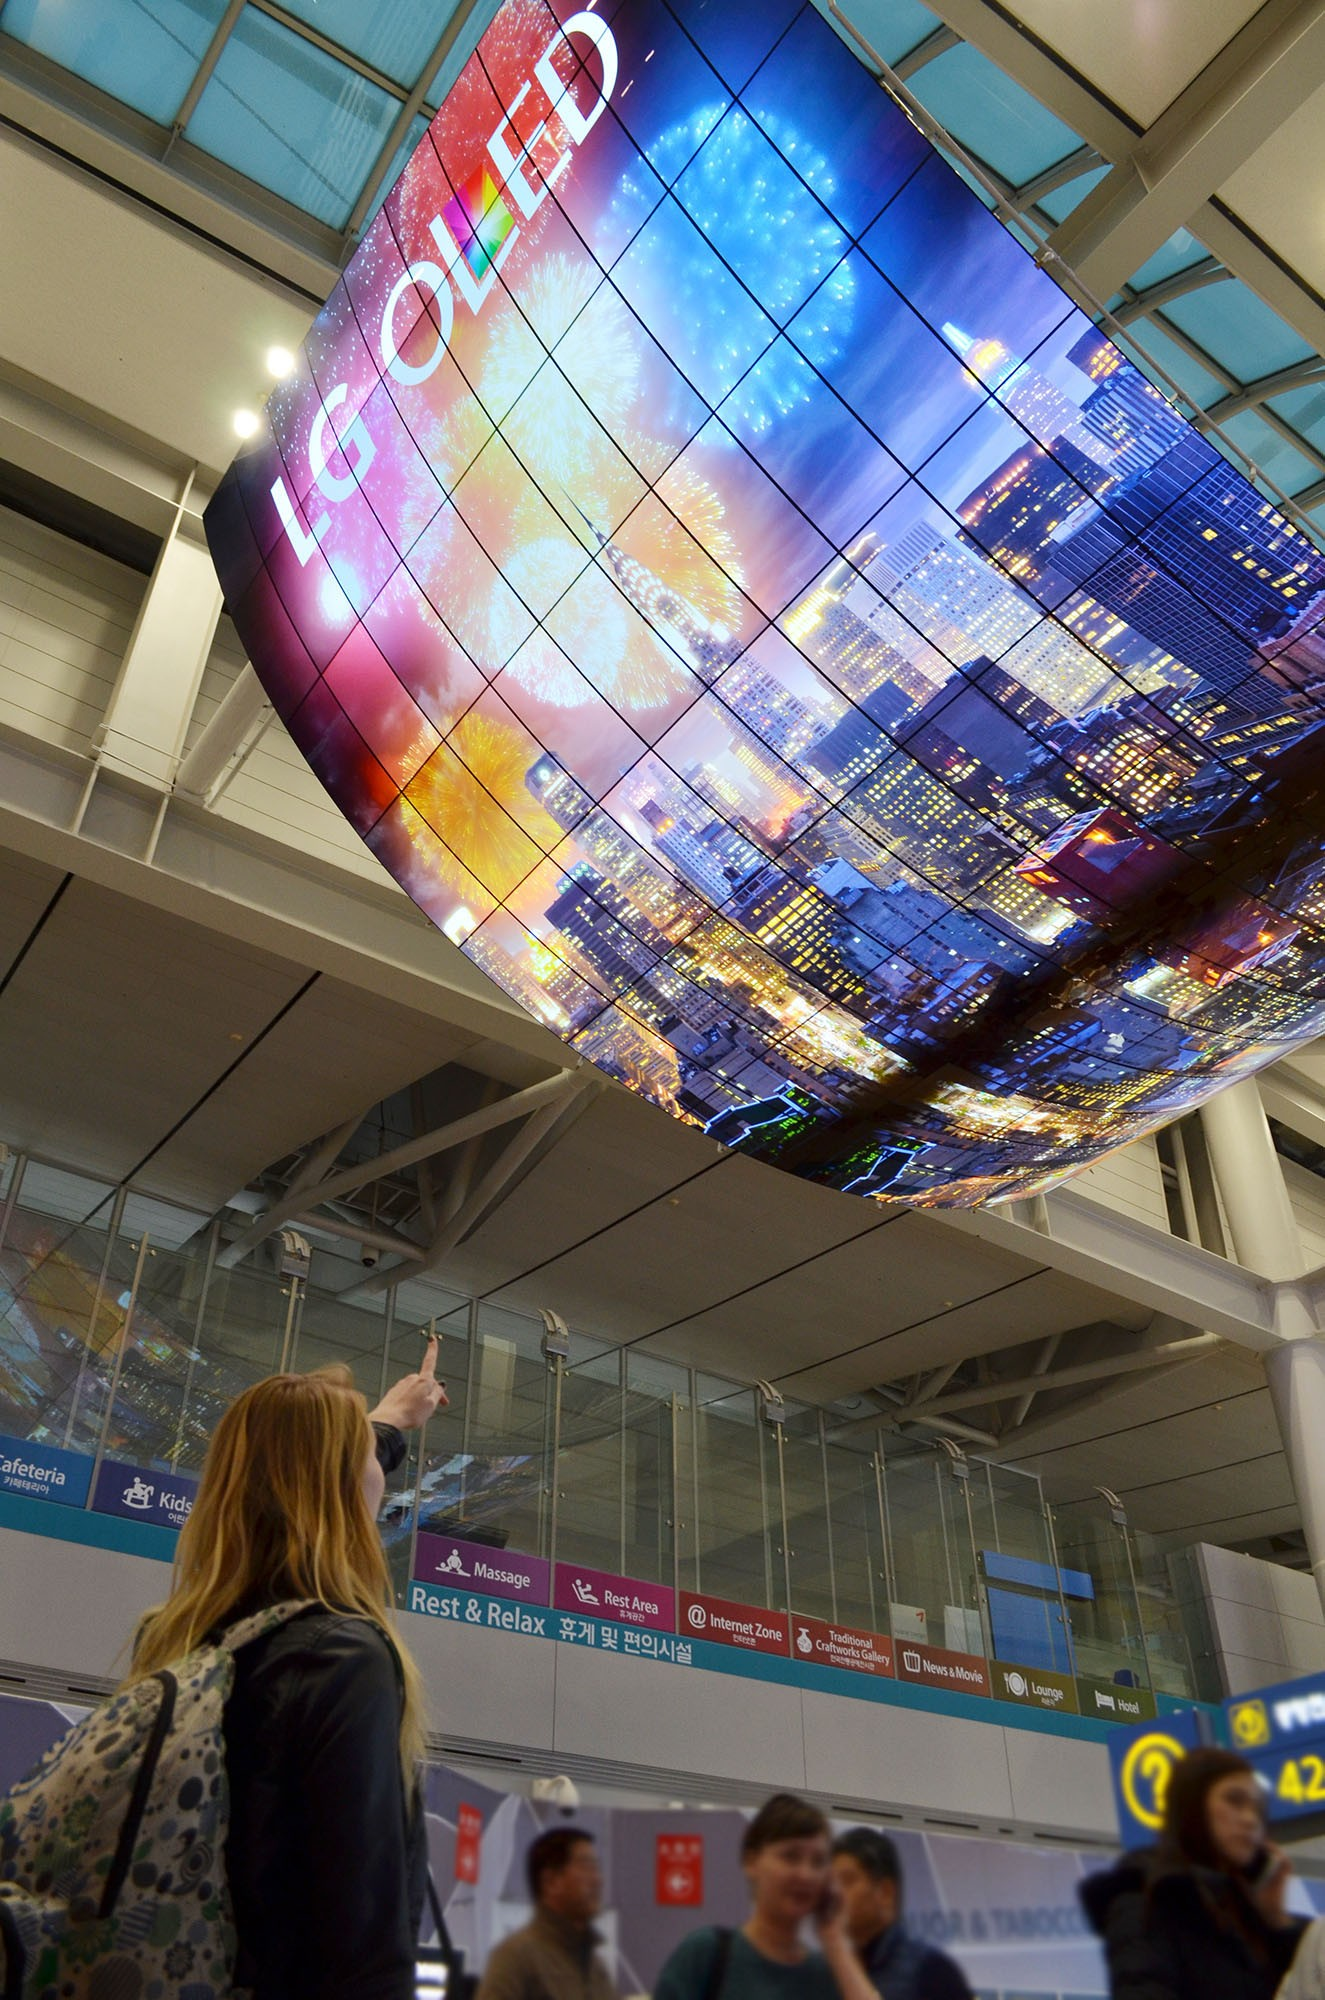 LG shows off their big OLED display at Incheon International